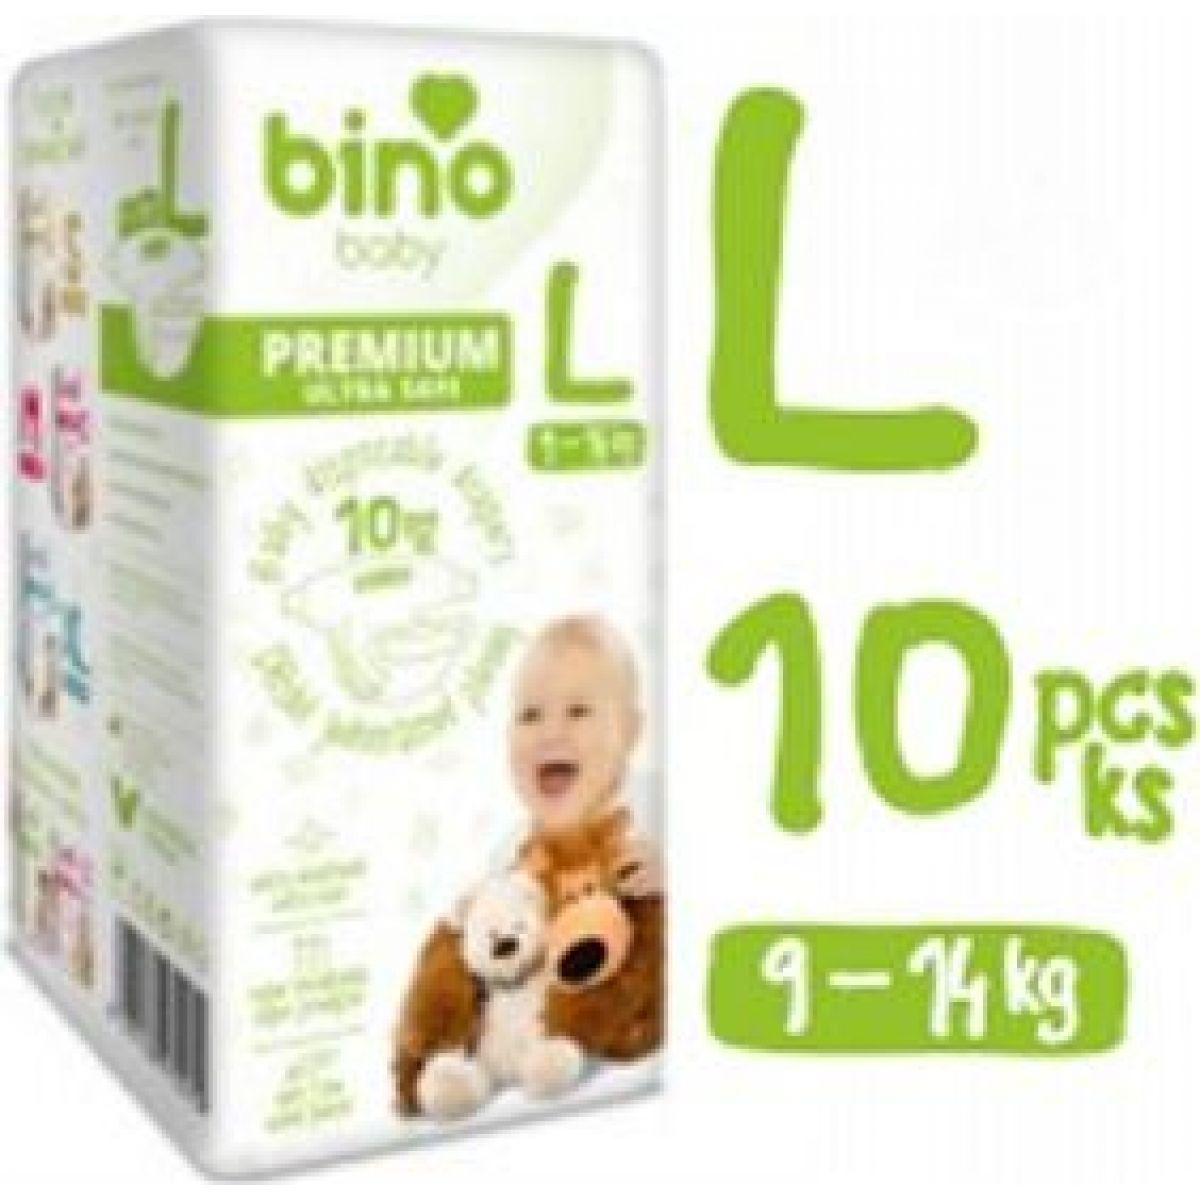 Bino Baby Premium Pleny vel. L 9-14 kg 6x10 ks s dárkem